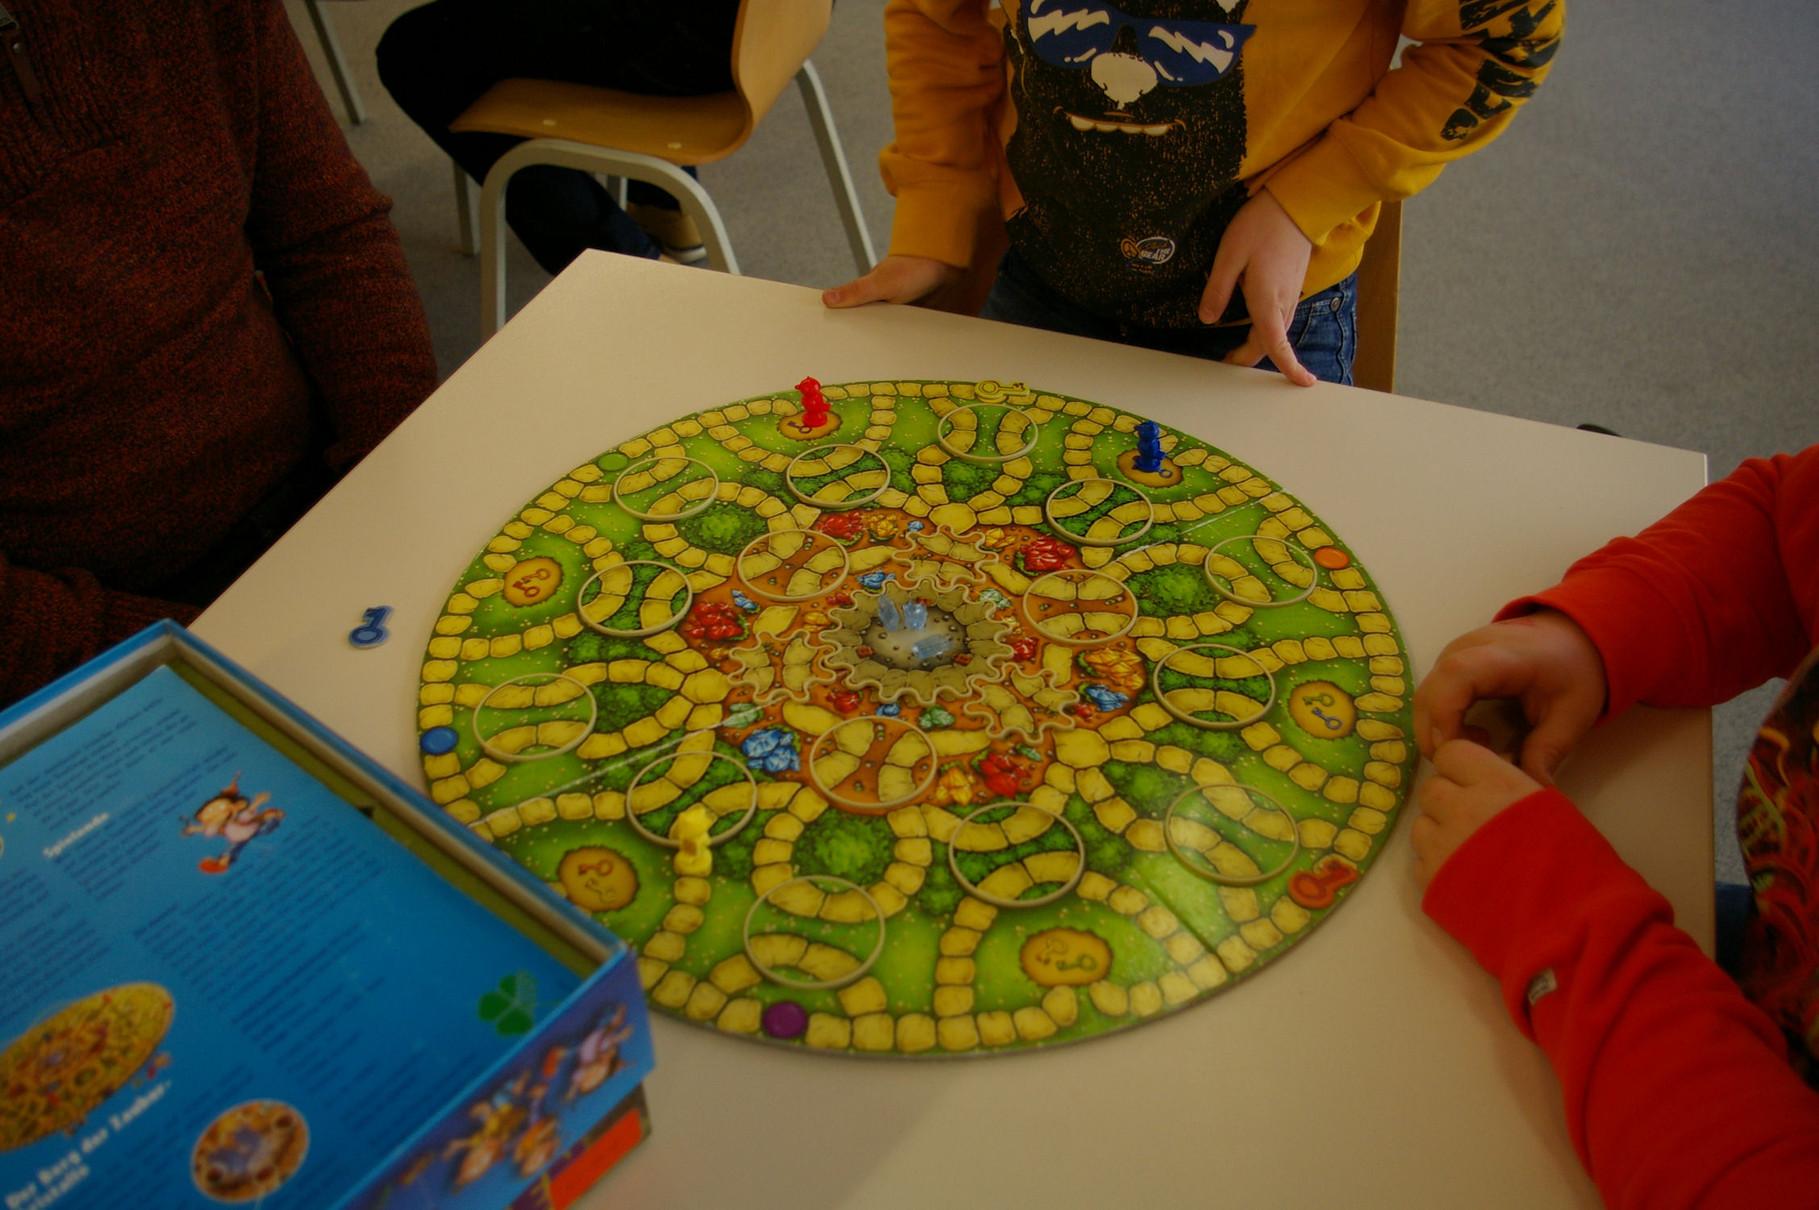 Familiensonntag Spiele